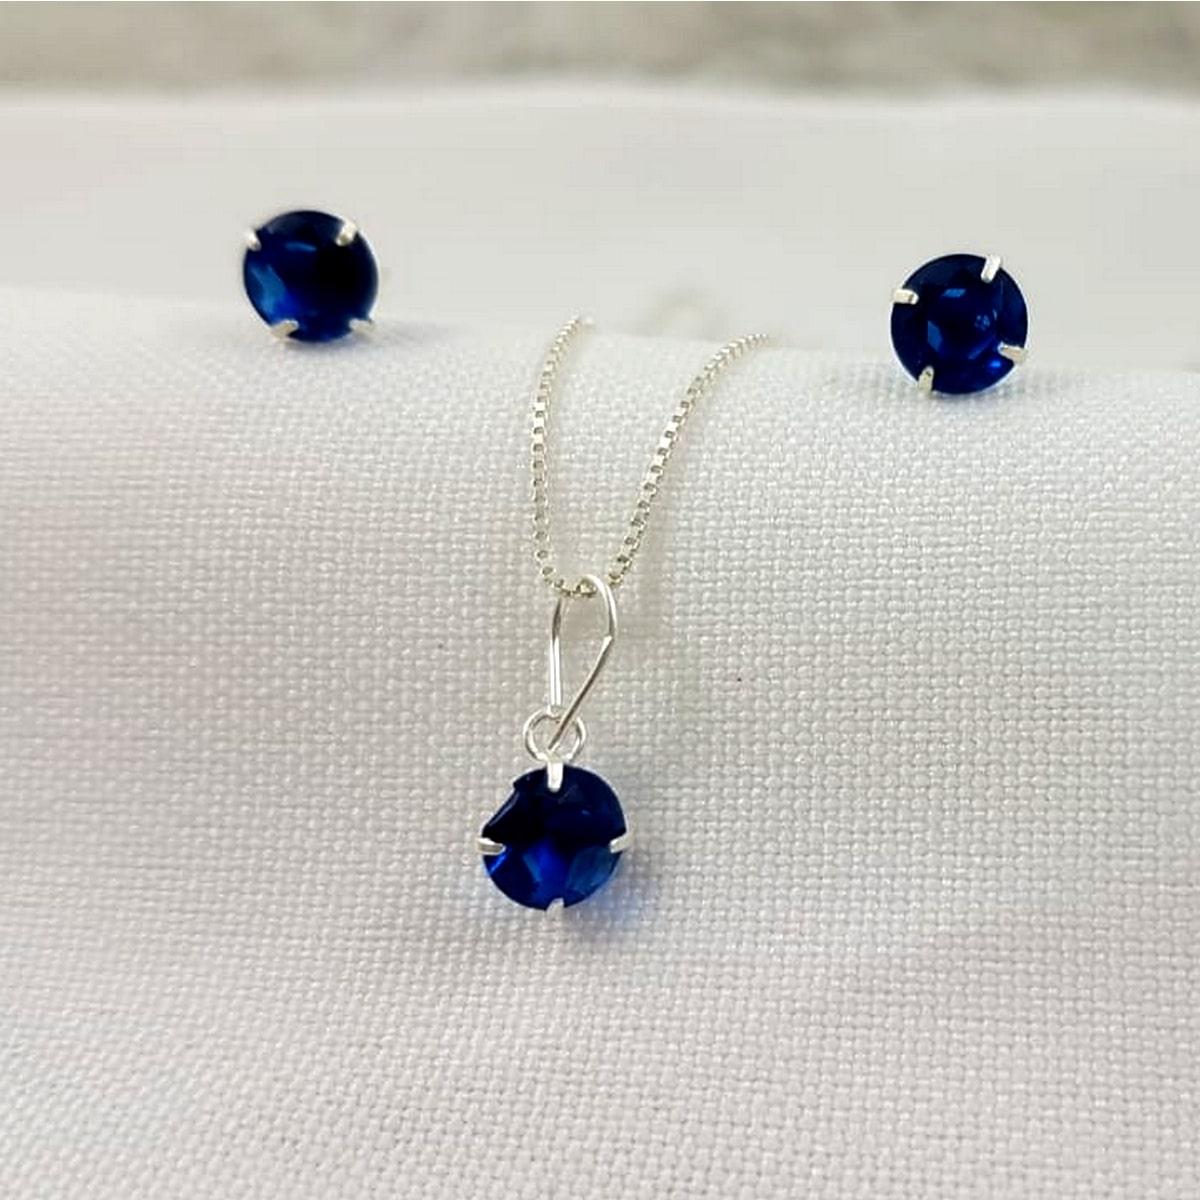 Conjunto Prata Feminina Pedra Azul Marinho